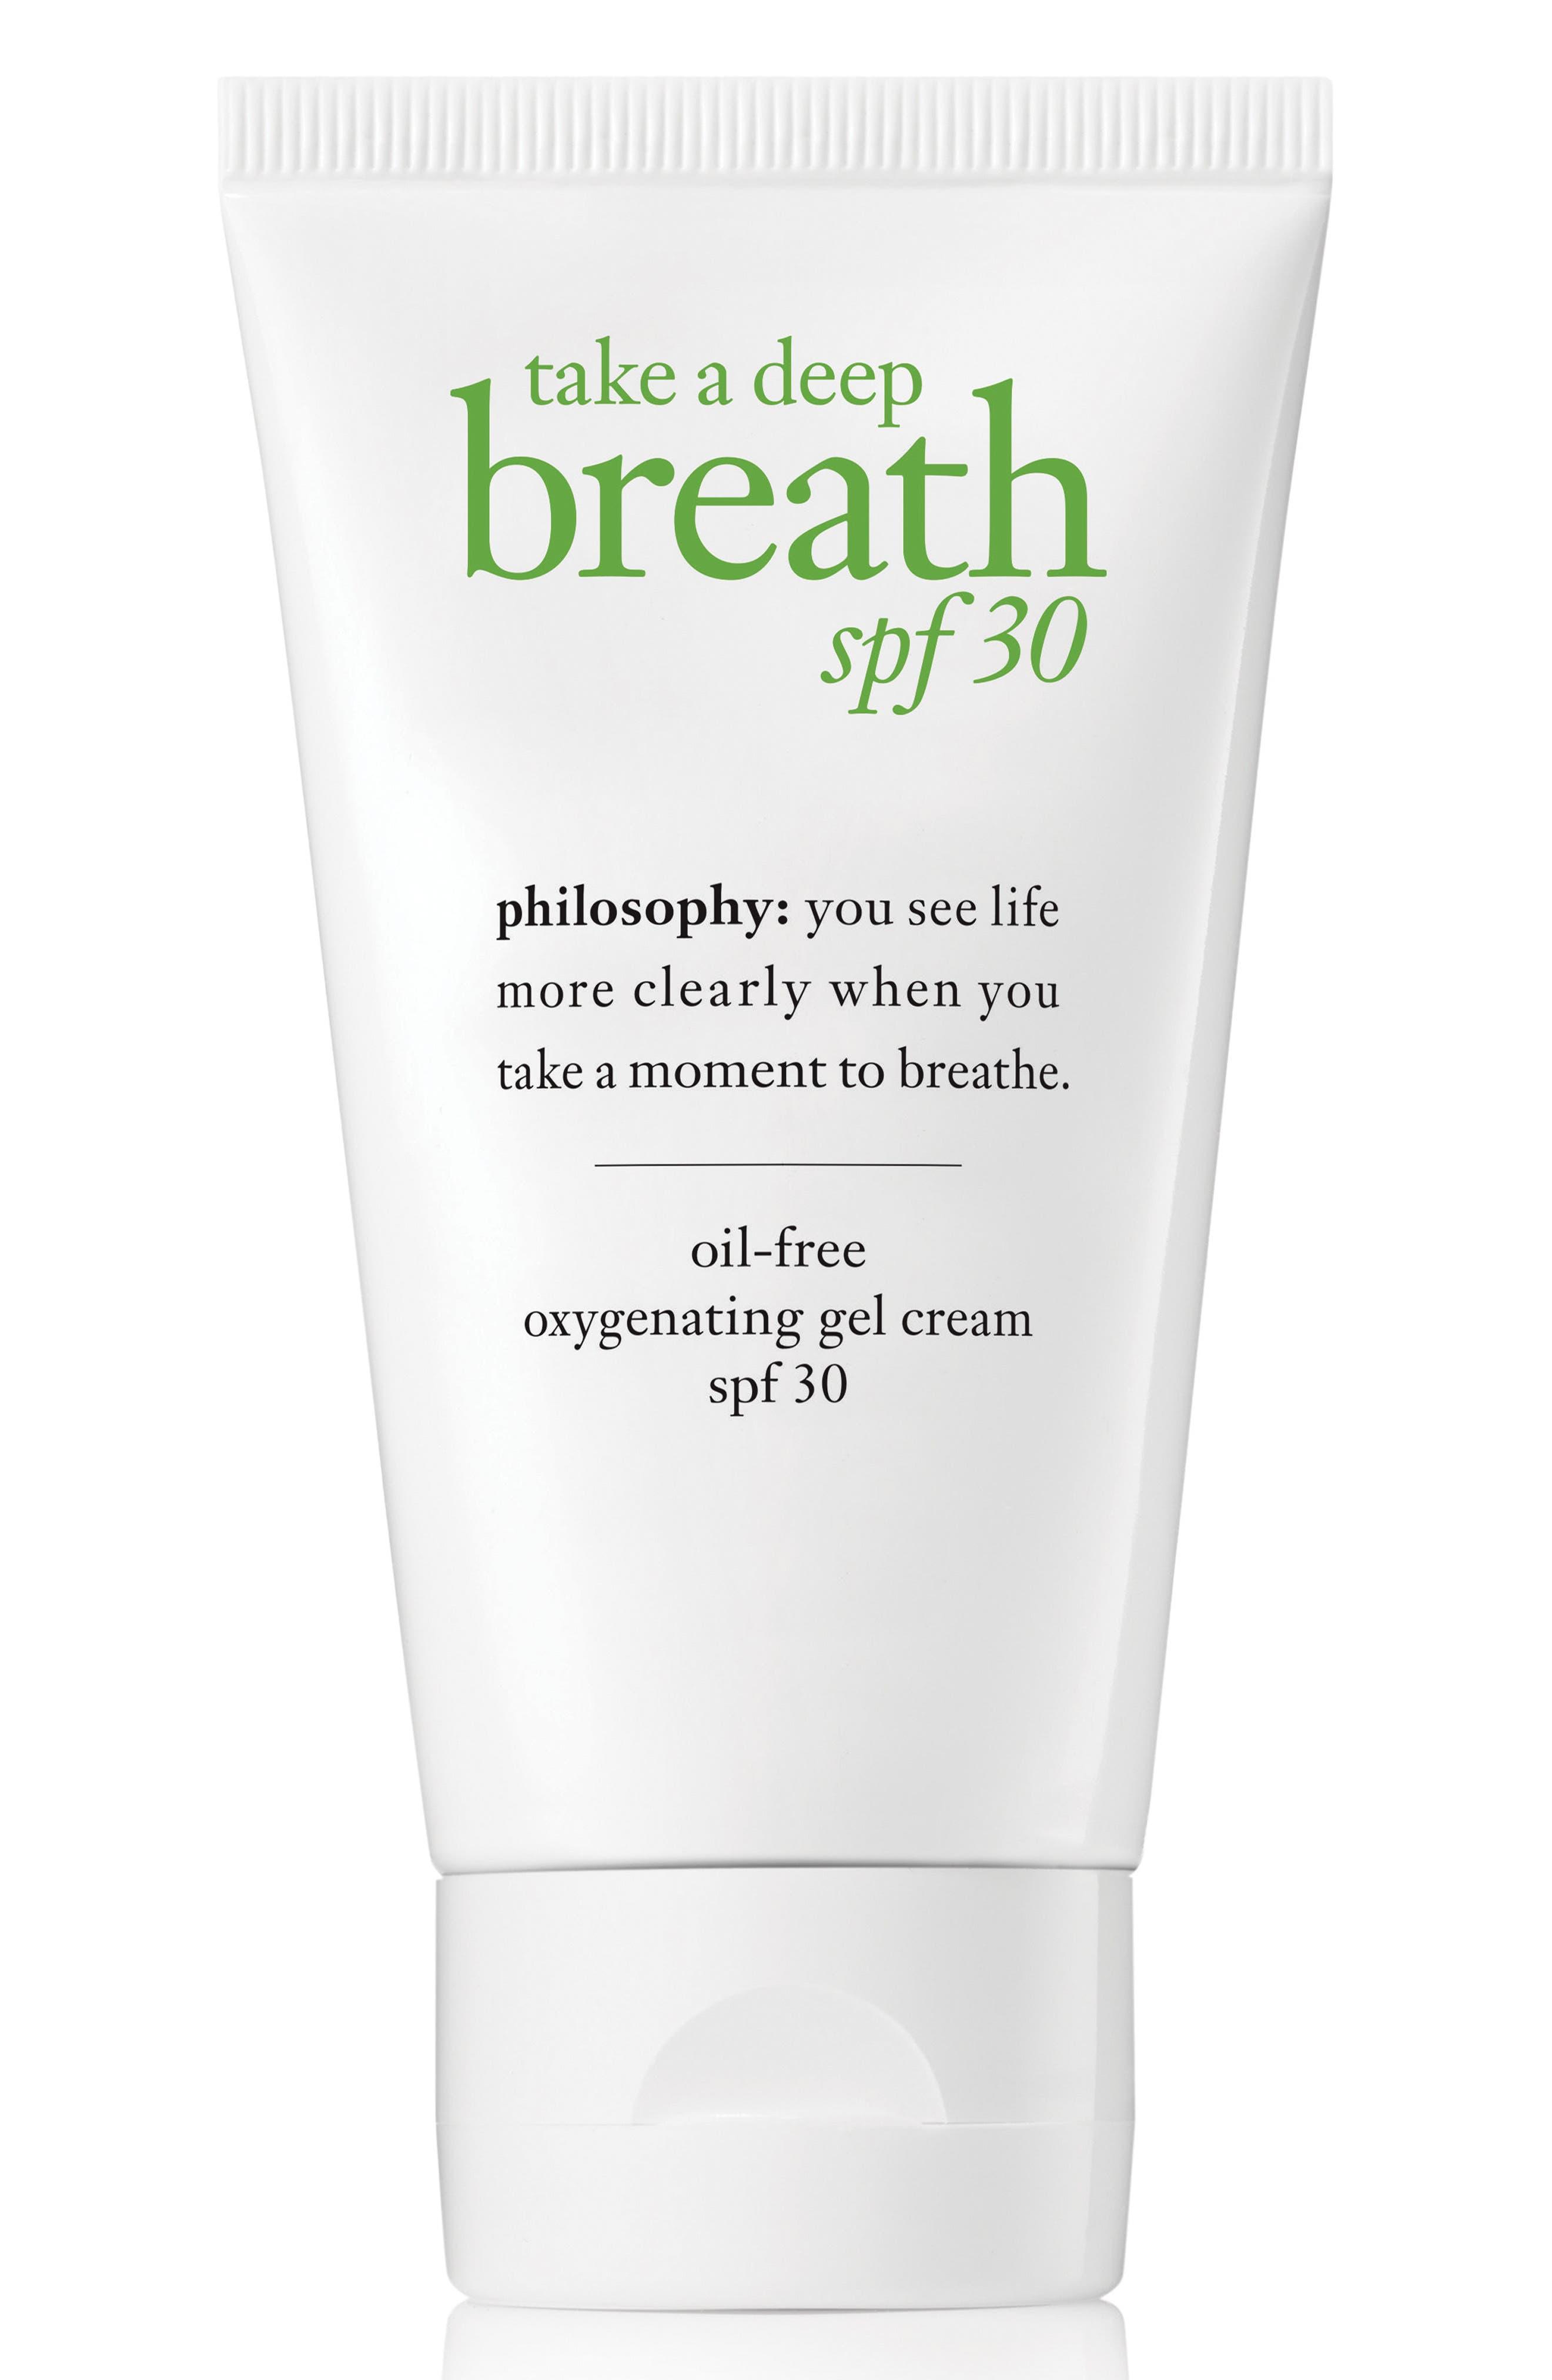 Main Image - philosophy take a deep breath oil-free oxygenating gel cream SPF 30